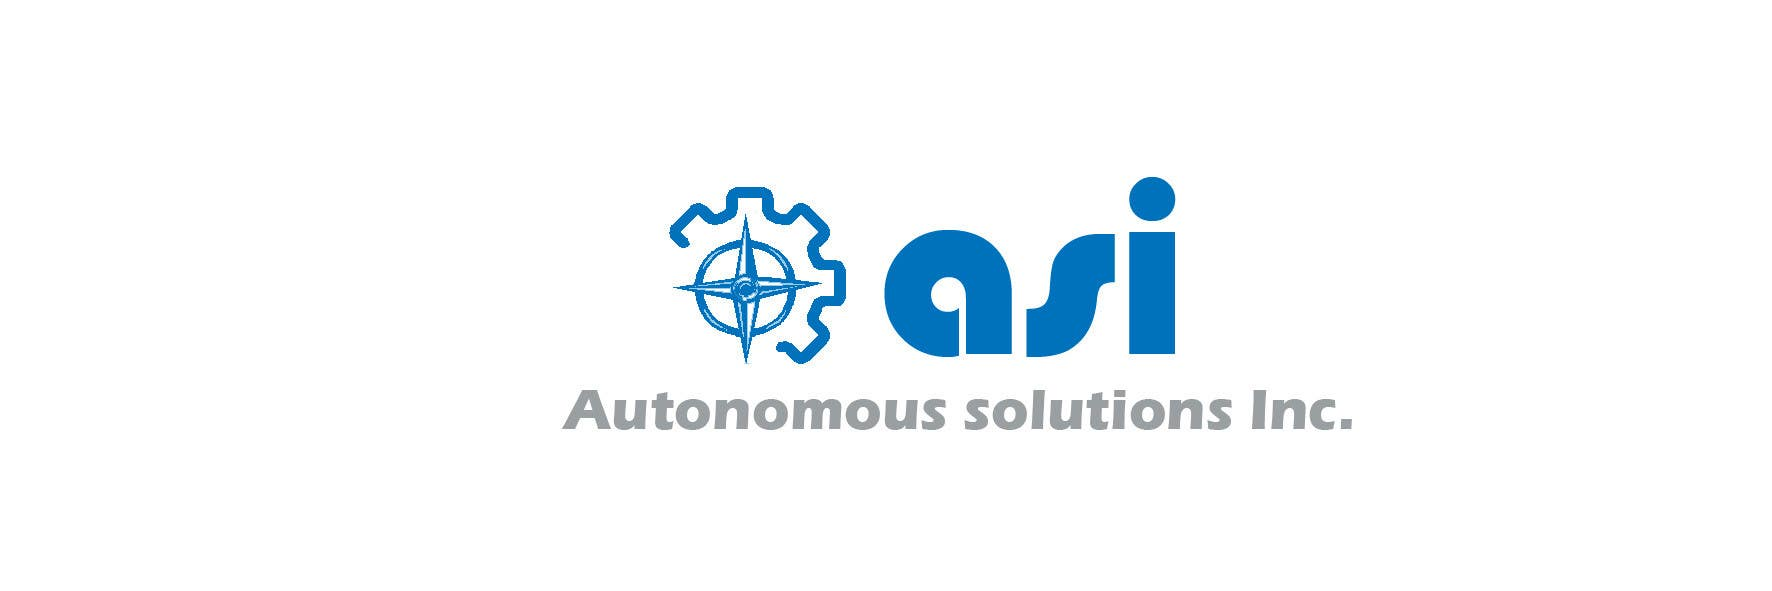 Entri Kontes #65 untukLogo Design for Autonomous Solutions Inc.